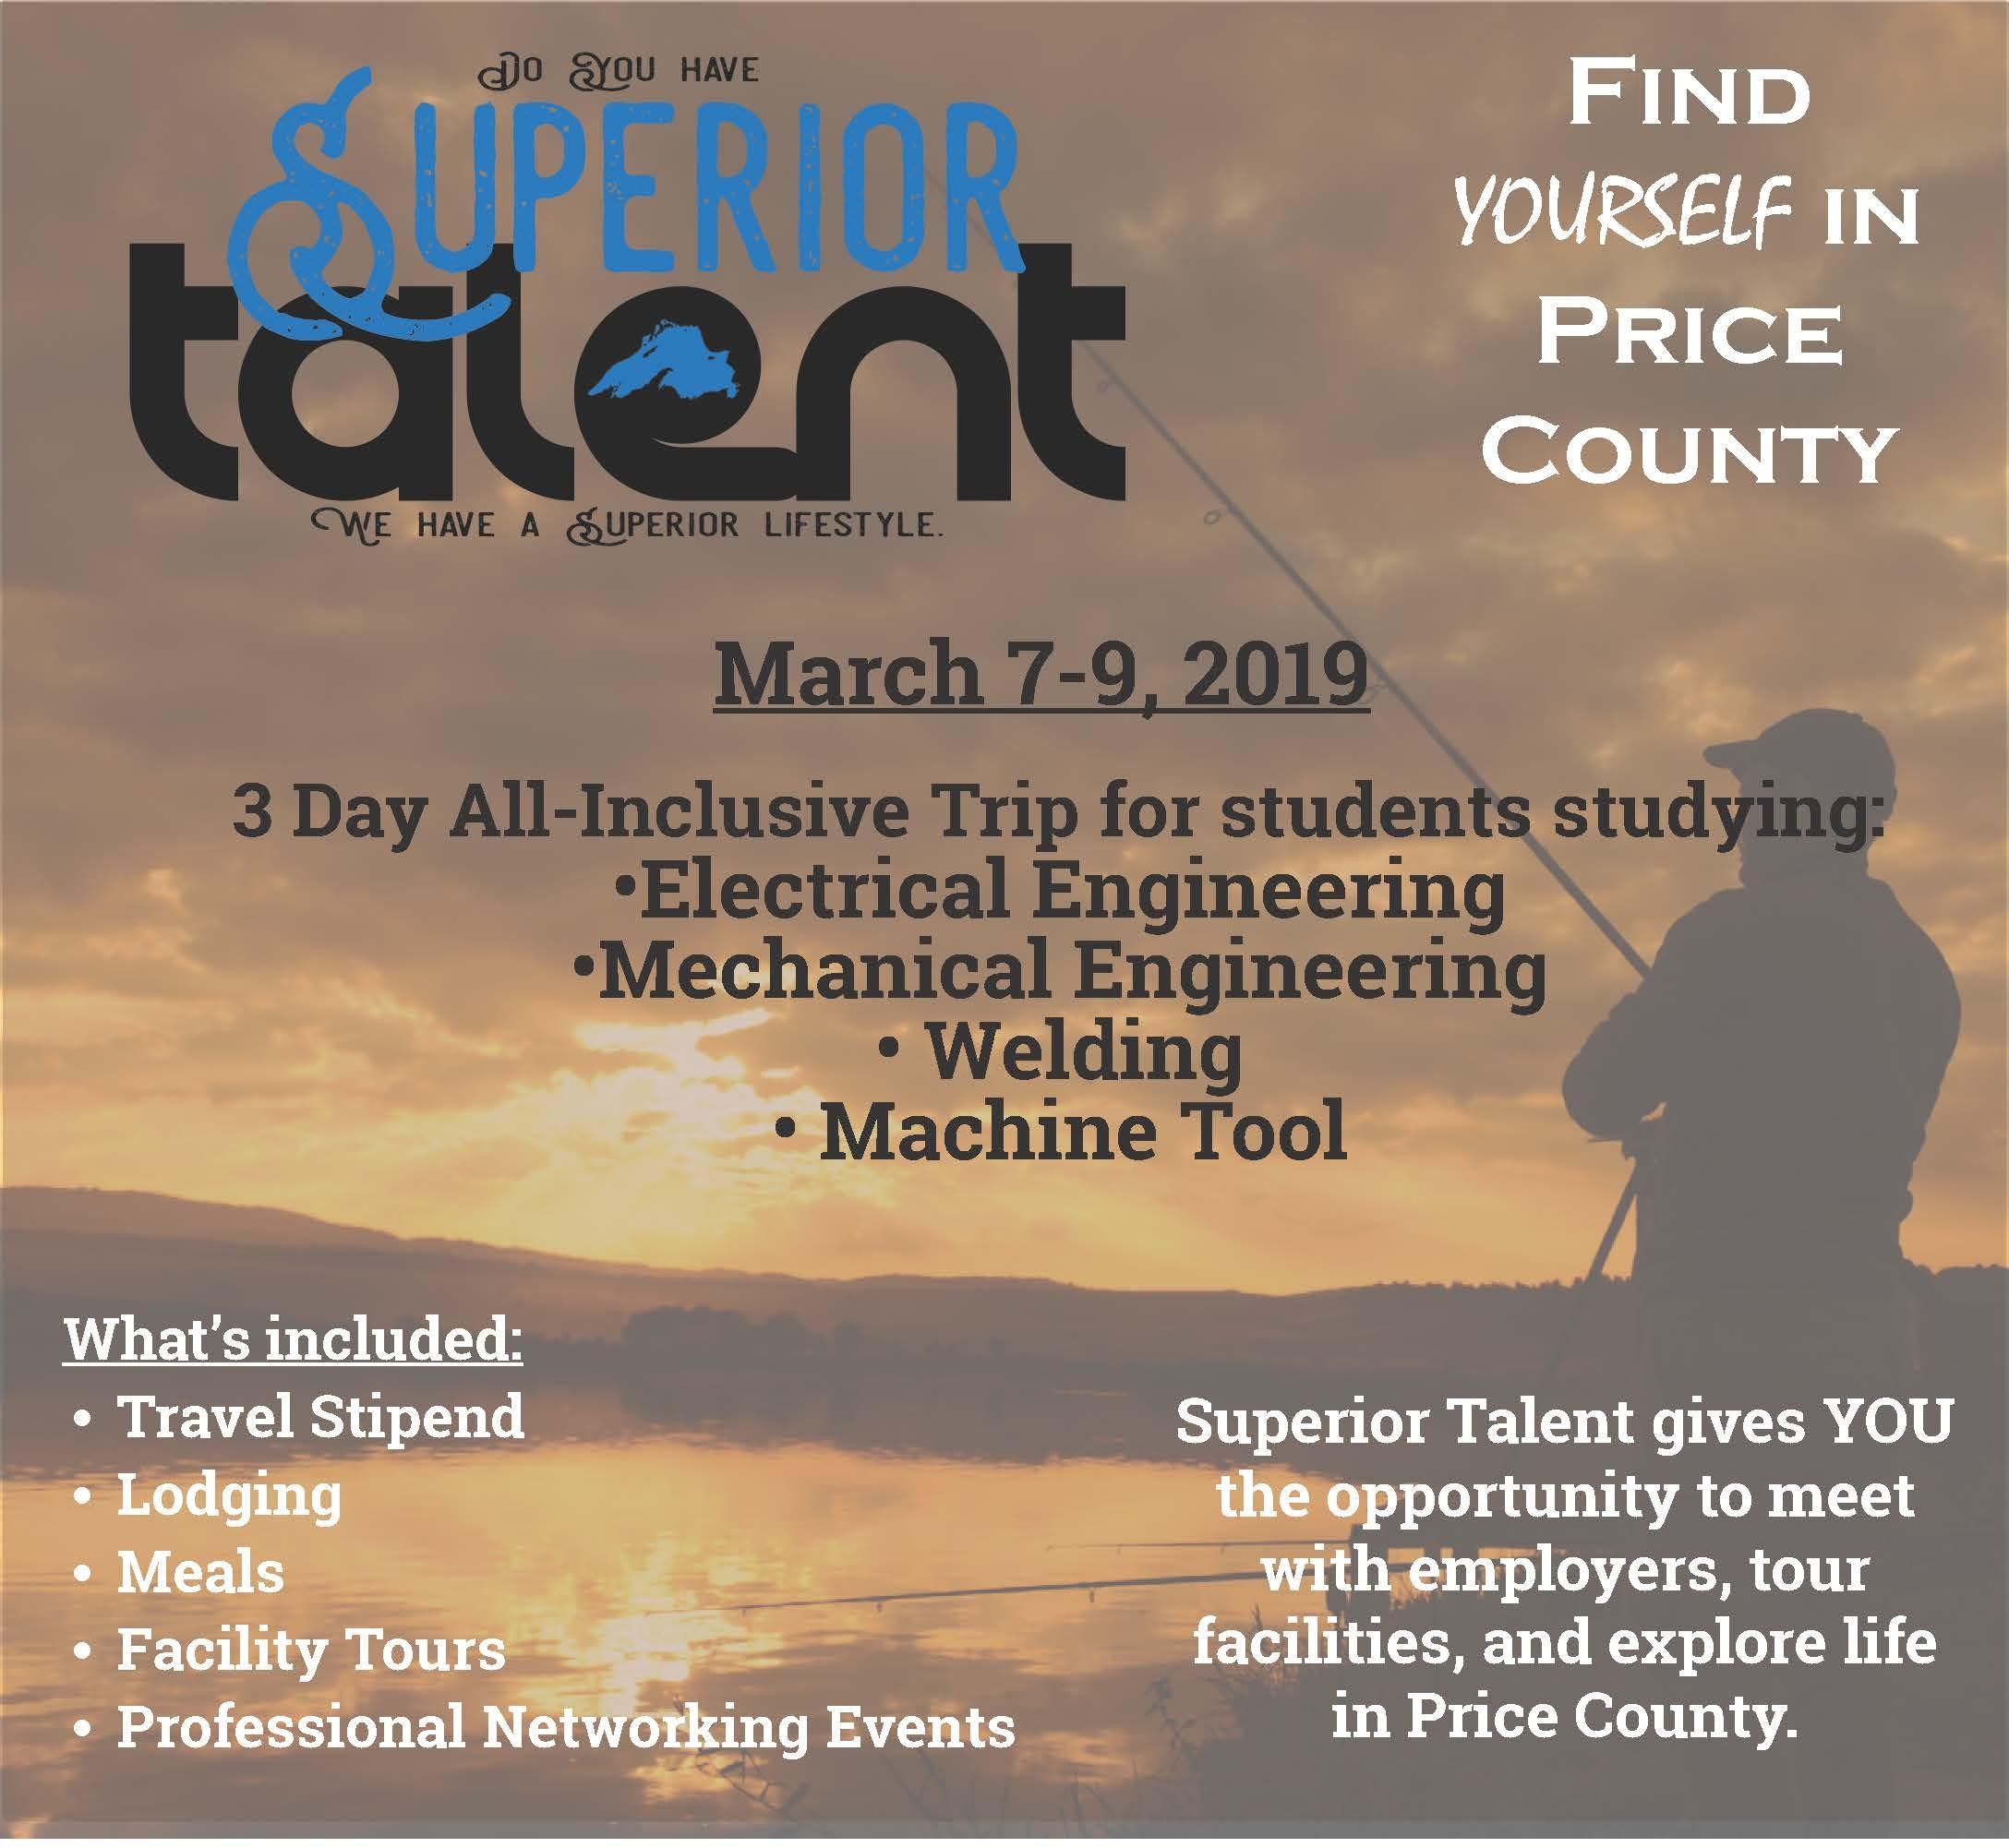 SuperiorTalent+2019+Student+Flyer-+Image.jpg